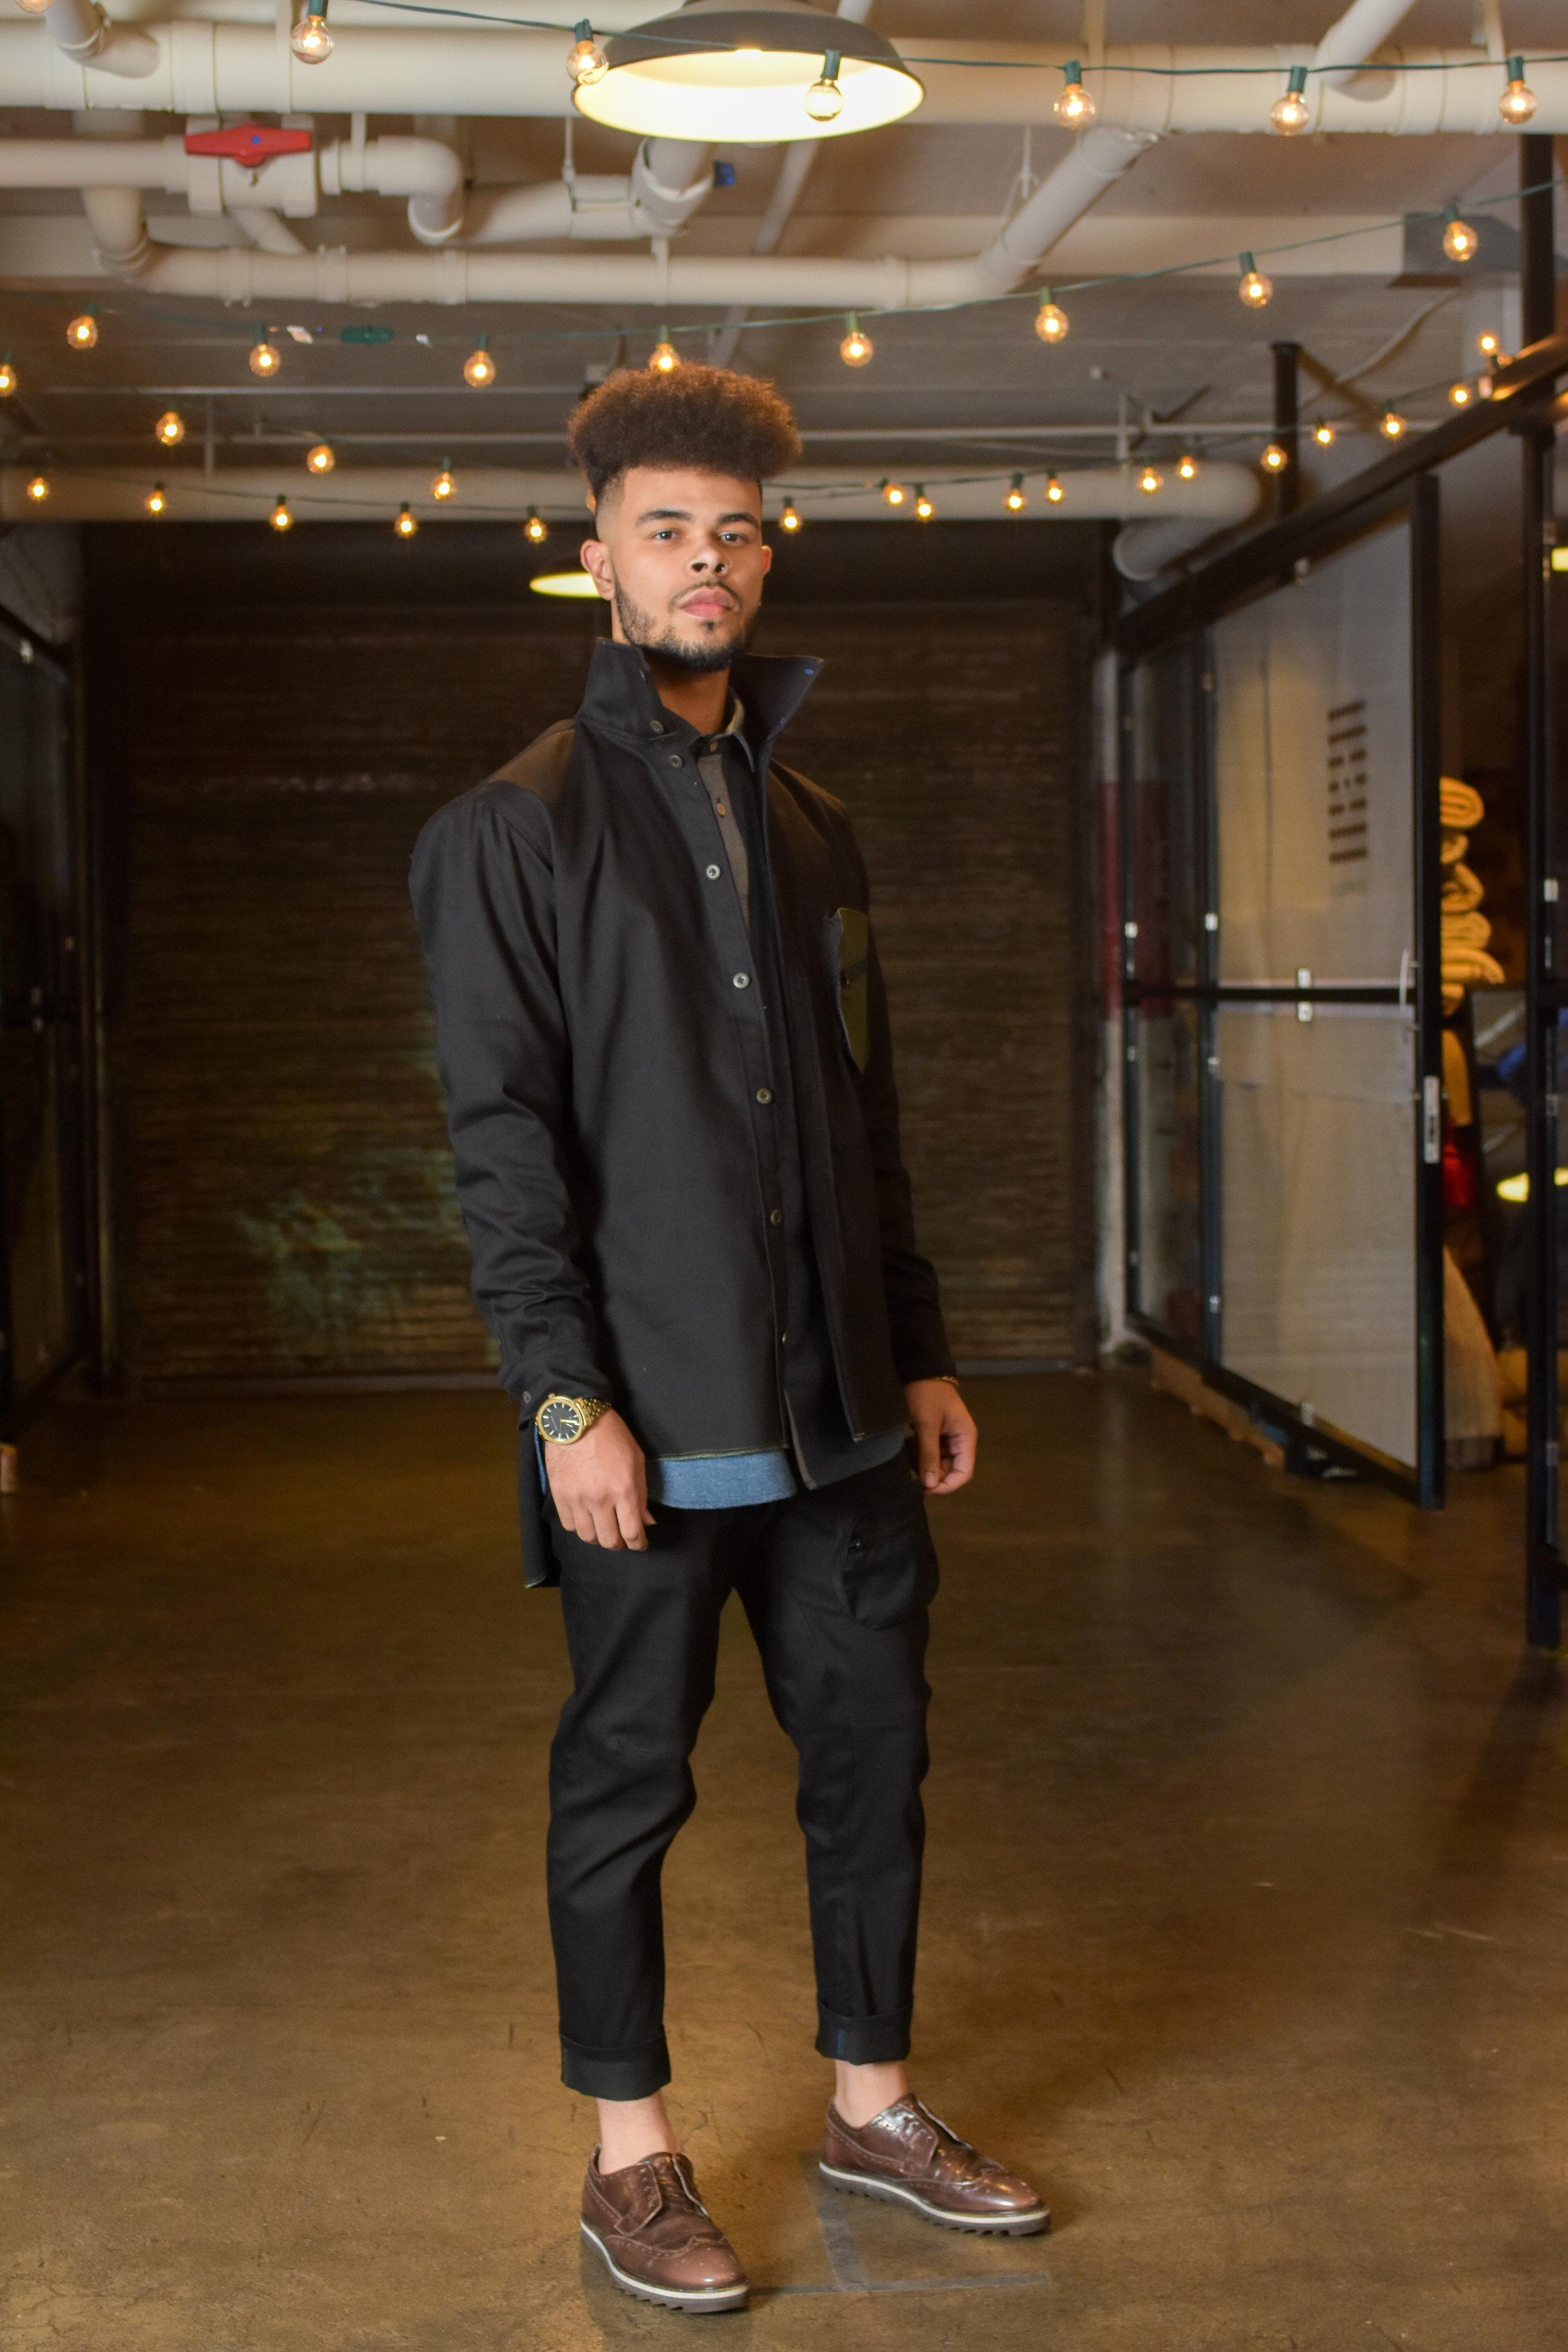 Stetch denim high neck shirt, flannel chambray raglan sleeve shirt, stitch denim trousers with thigh pocket.